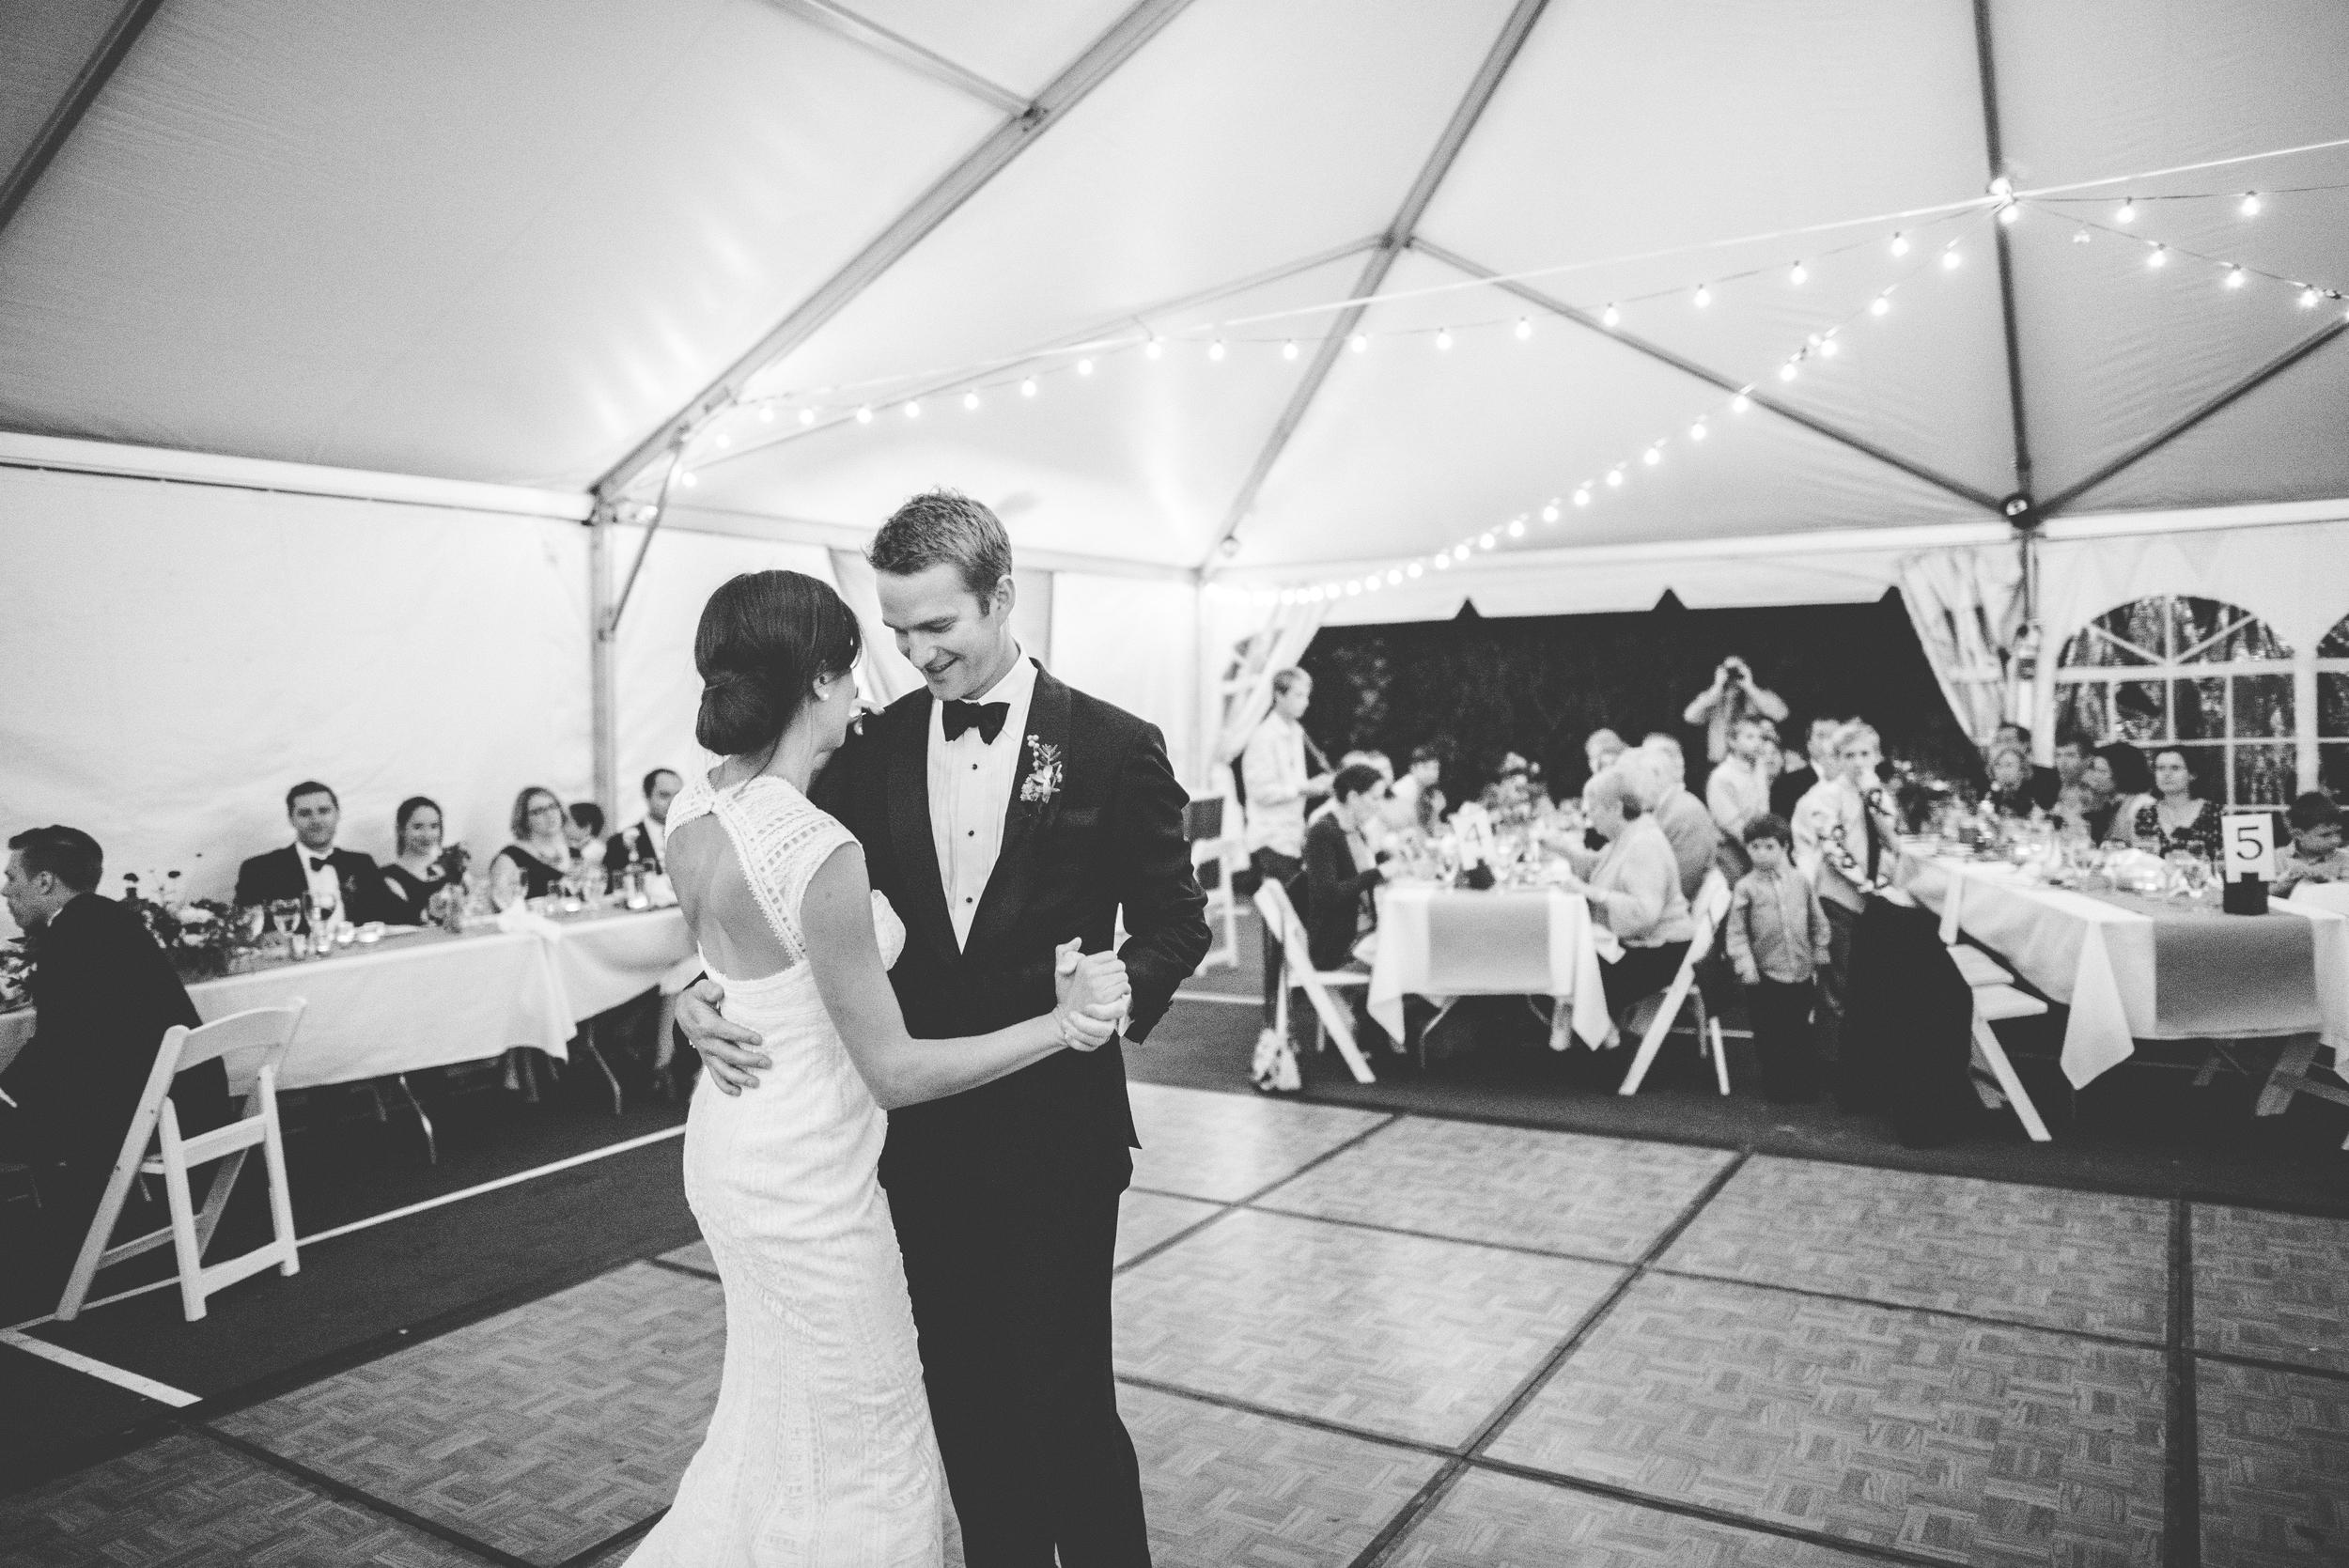 Brad&Libby_Wedding_Photos23226.jpg